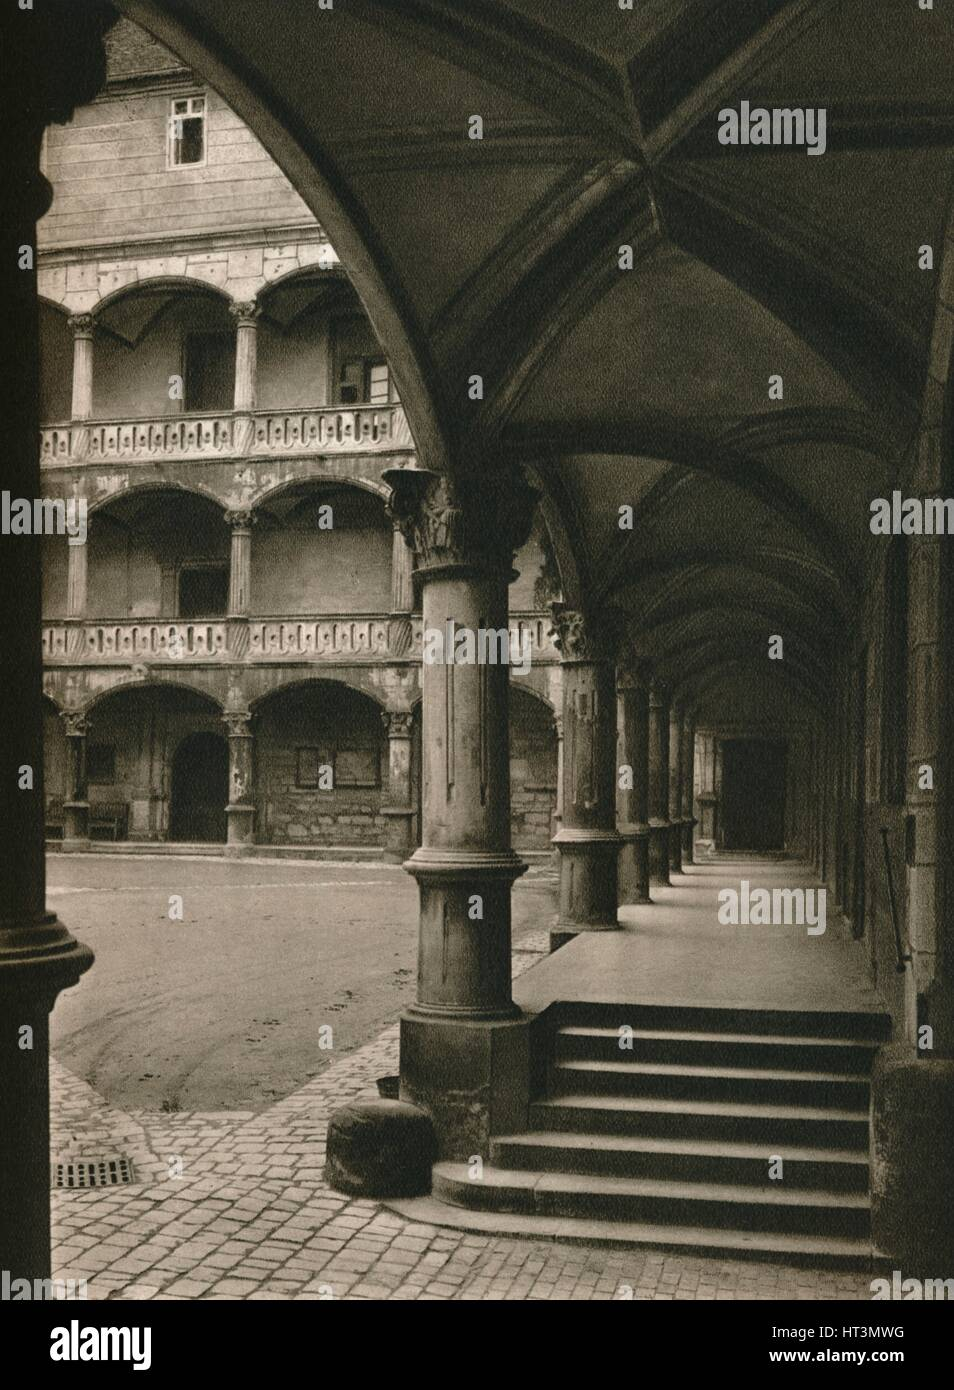 Künstler Stuttgart stuttgart im hof des alten schlosses 1931 künstler kurt